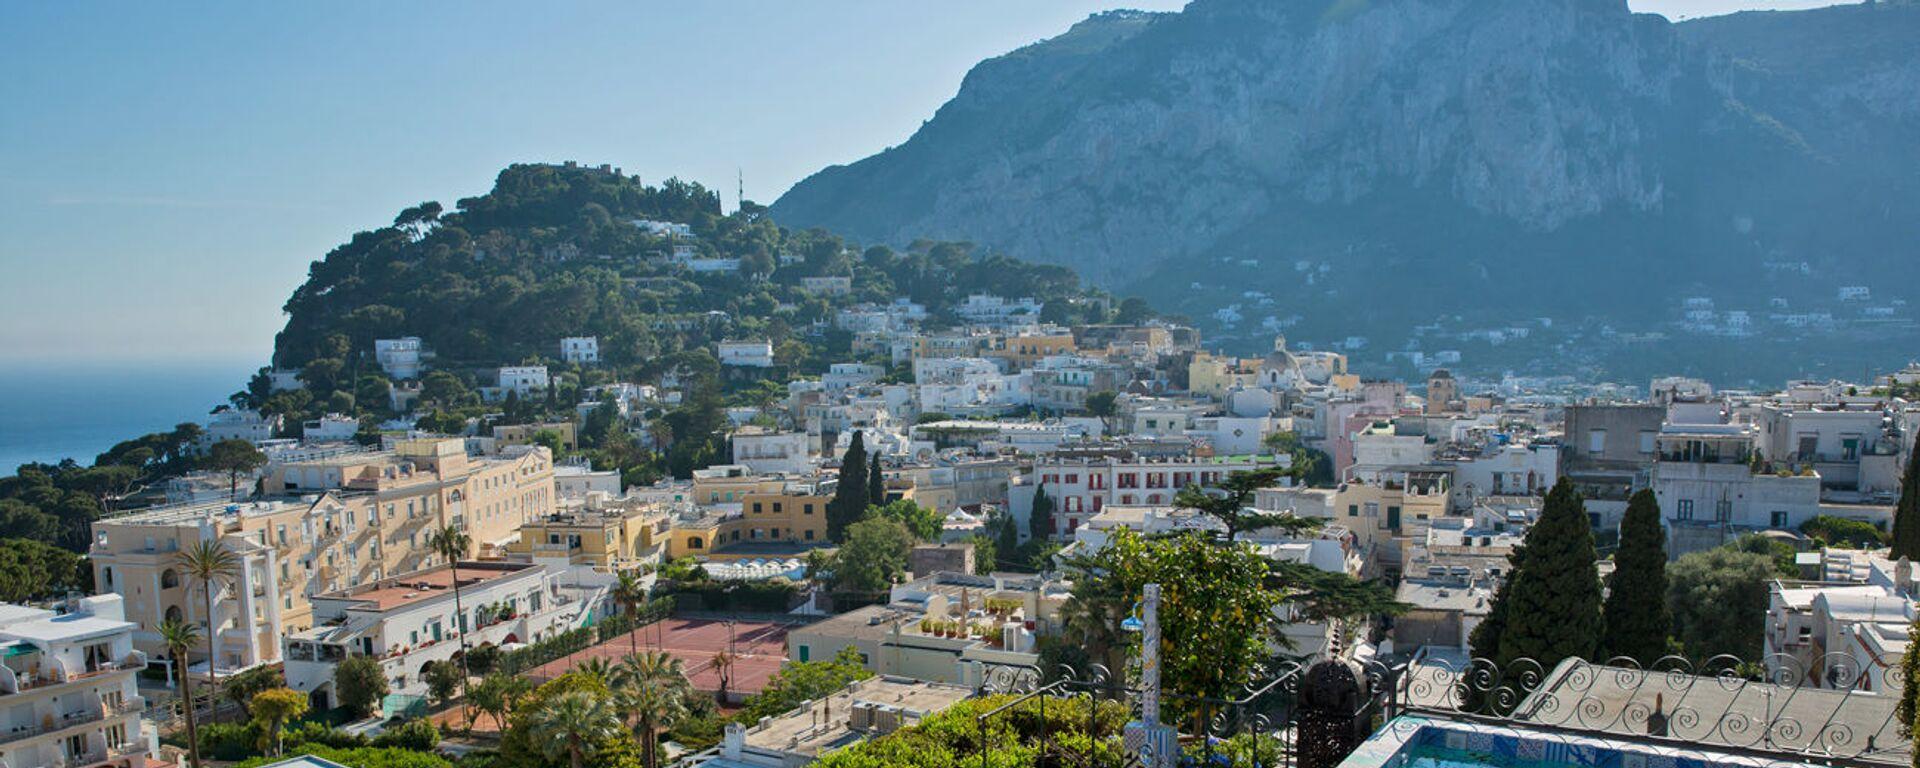 La vista dall'albergo Capri Tiberio Palace a Capri, Italia. - Sputnik Italia, 1920, 16.04.2021